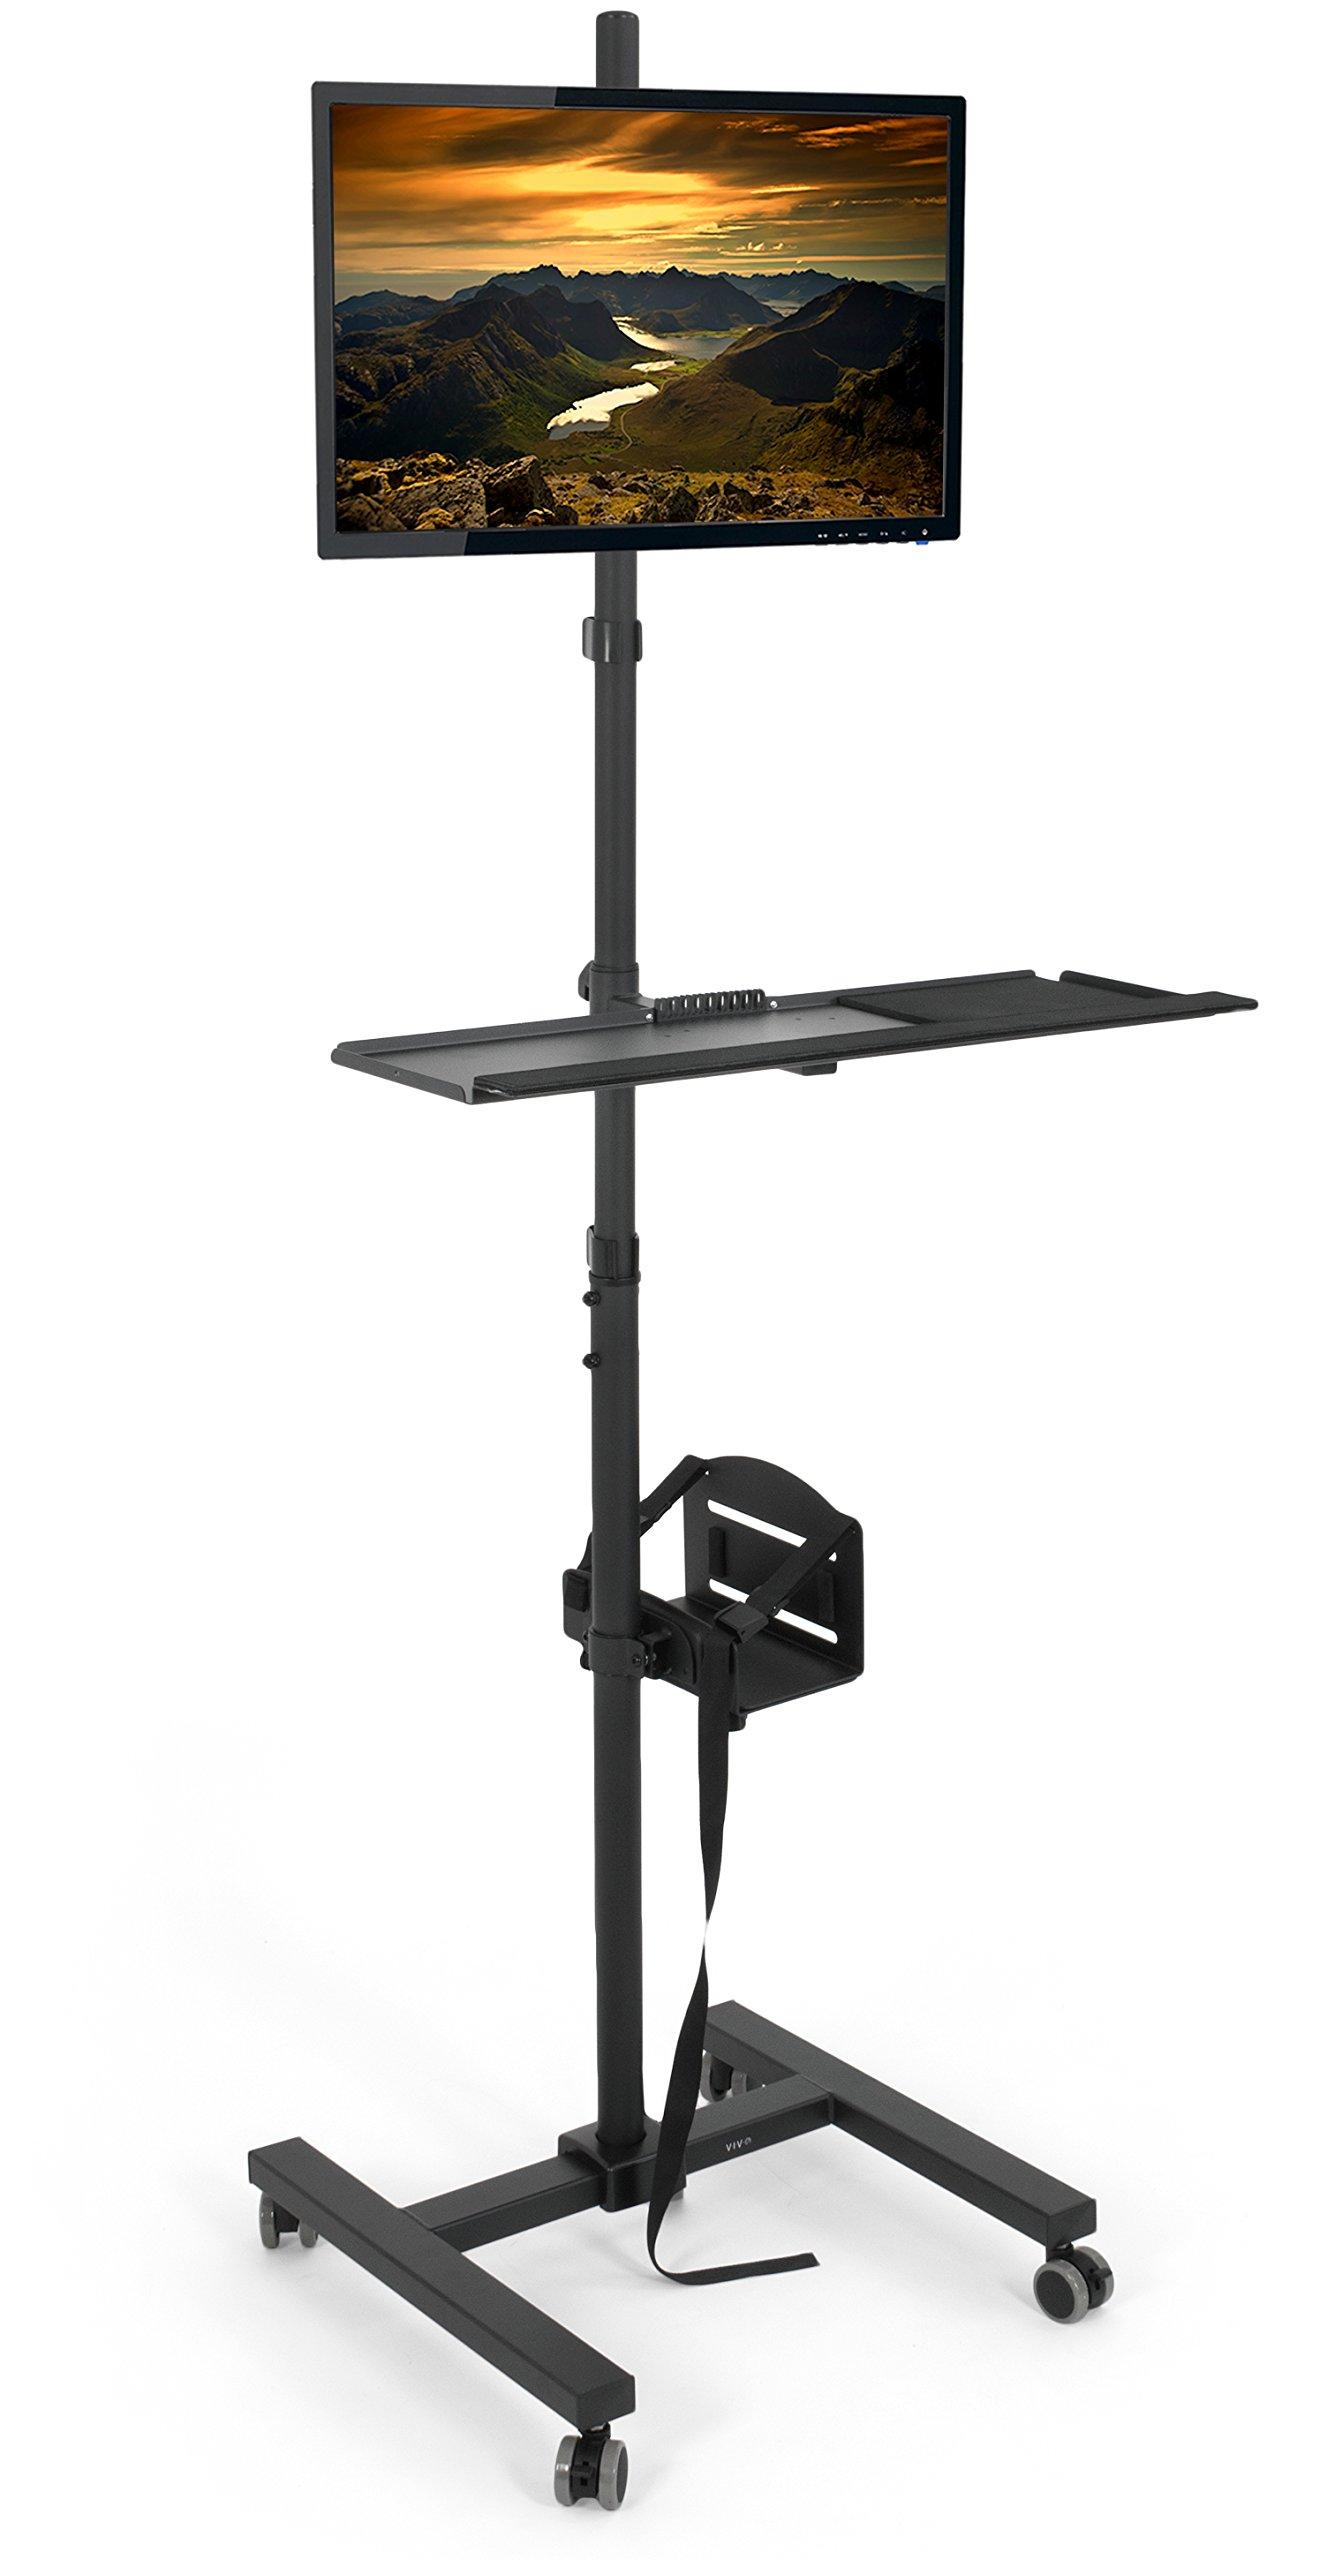 VIVO Black Computer Mobile Cart Rolling Stand | Adjustable Monitor Mount 32'' Case Holder & Keyboard Tray Moving Workstation (CART-PC02T)